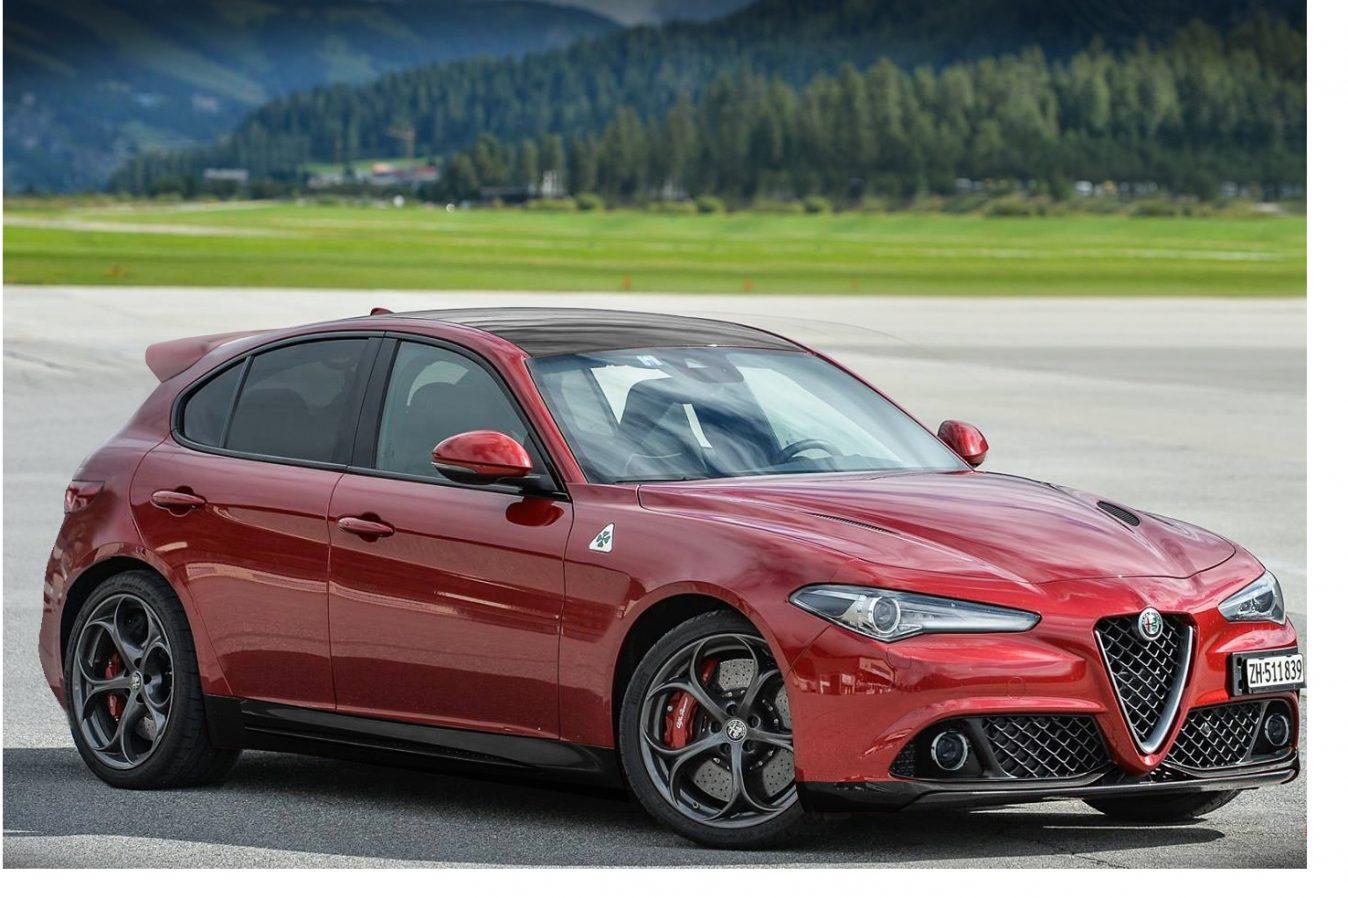 2019 Alfa Romeo Giulietta Tail Light High Resolution Alfa Romeo Giulietta 2019 1348x898 Wallpaper Teahub Io